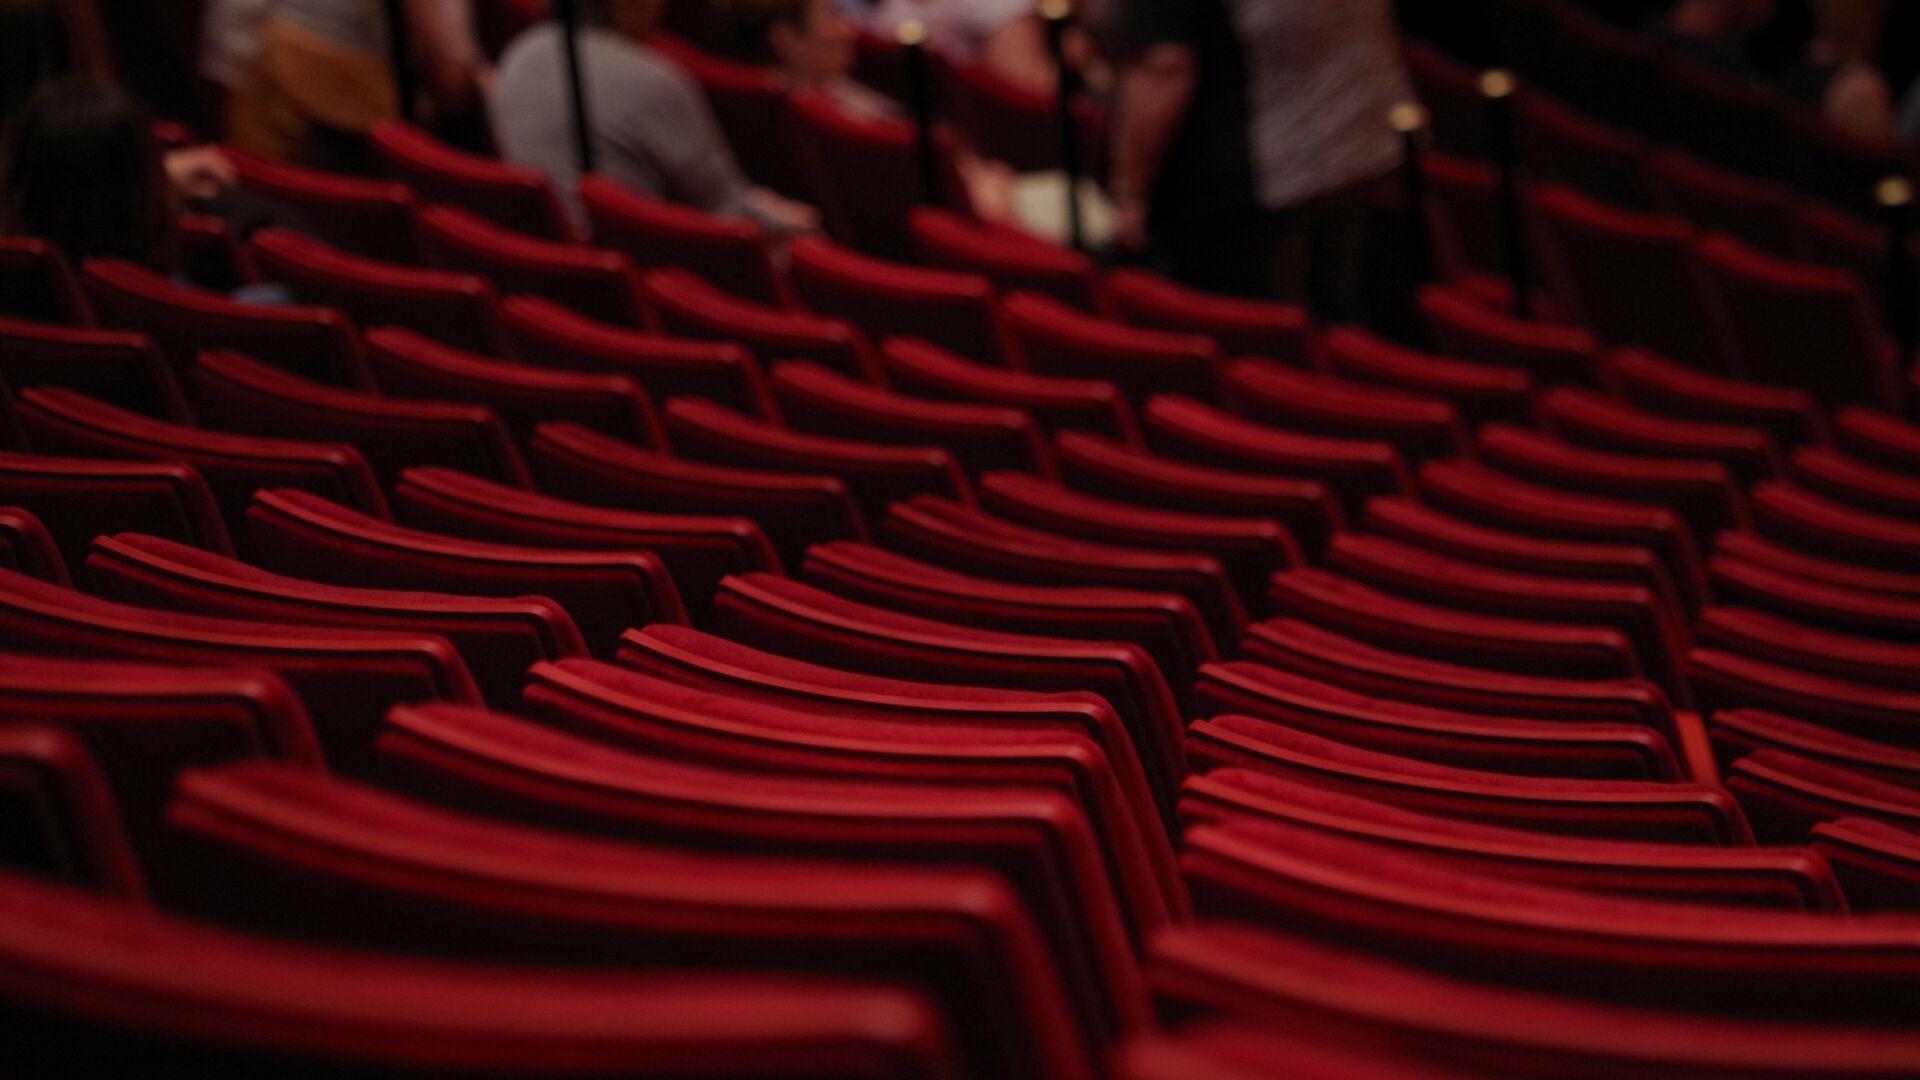 Teatro (imagen referencial) - Sputnik Mundo, 1920, 23.04.2021